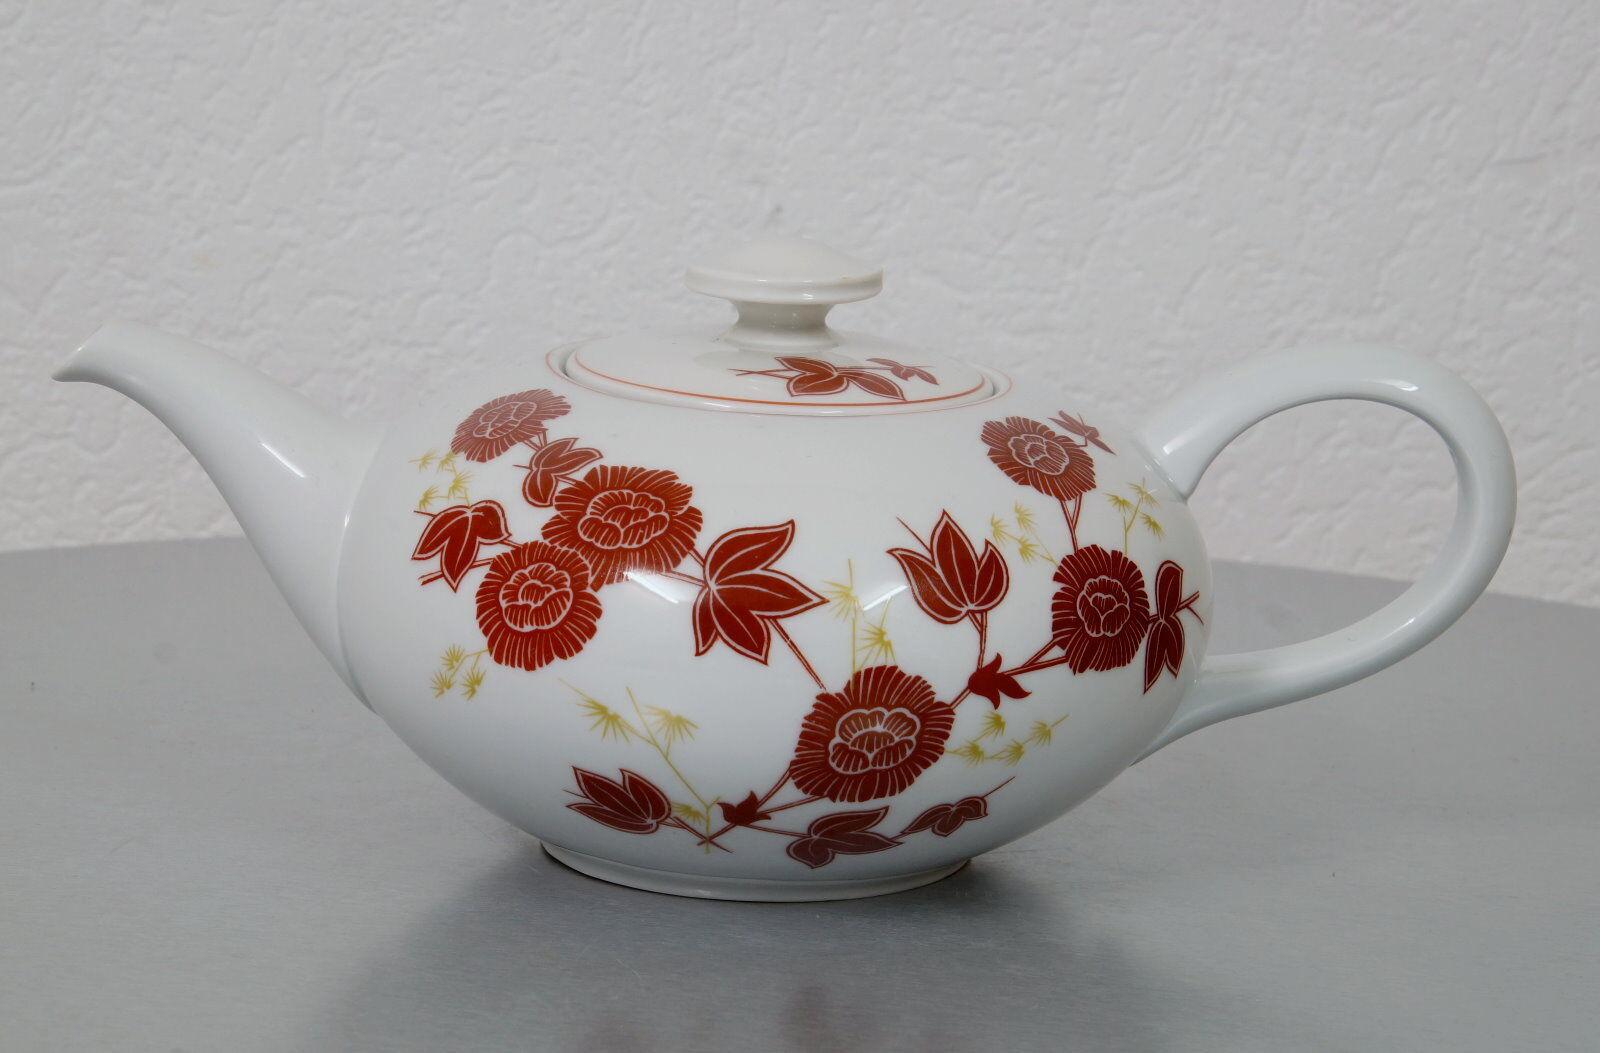 Hutschenreuther Selb Porzellan Teekanne Kaffee Kanne Art Dèco Dèco Dèco 40er Jahre US Zone 998fcc